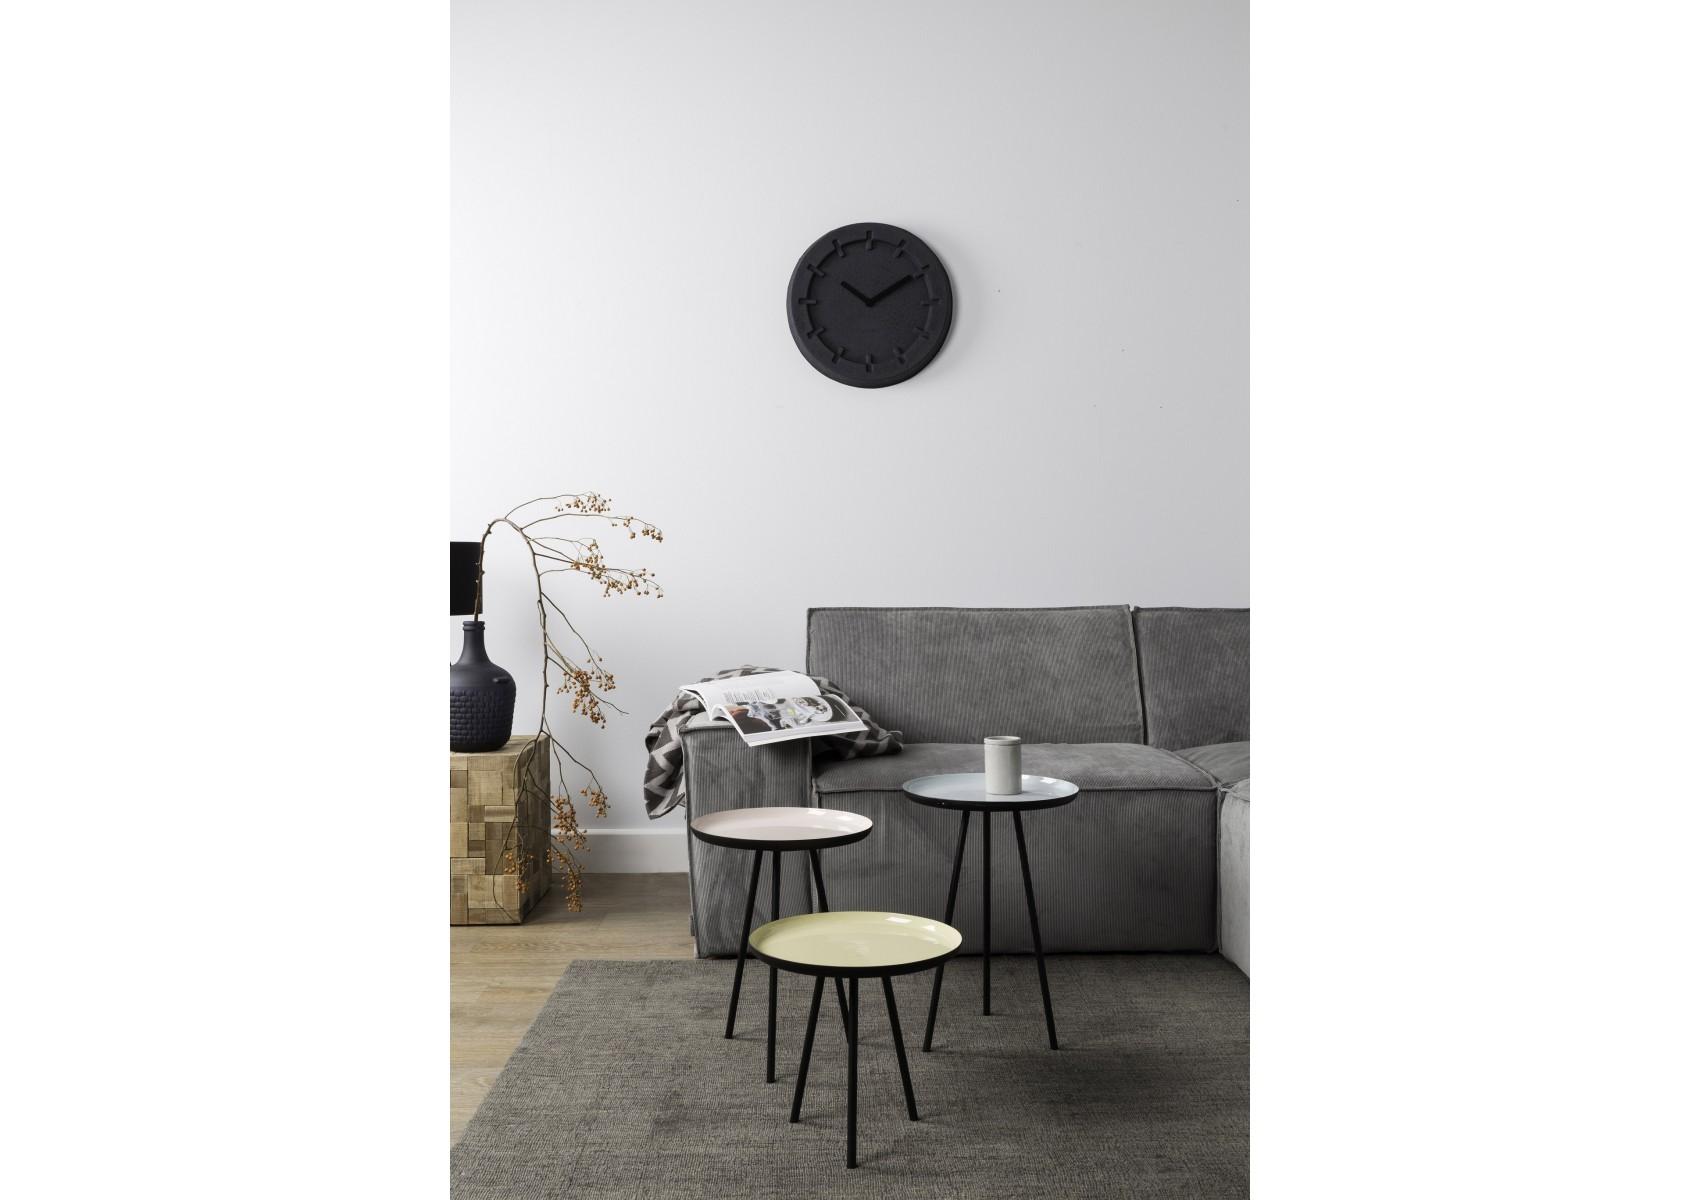 3 tables basses enamel en 3 couleurs pastel design scandinave boite design. Black Bedroom Furniture Sets. Home Design Ideas